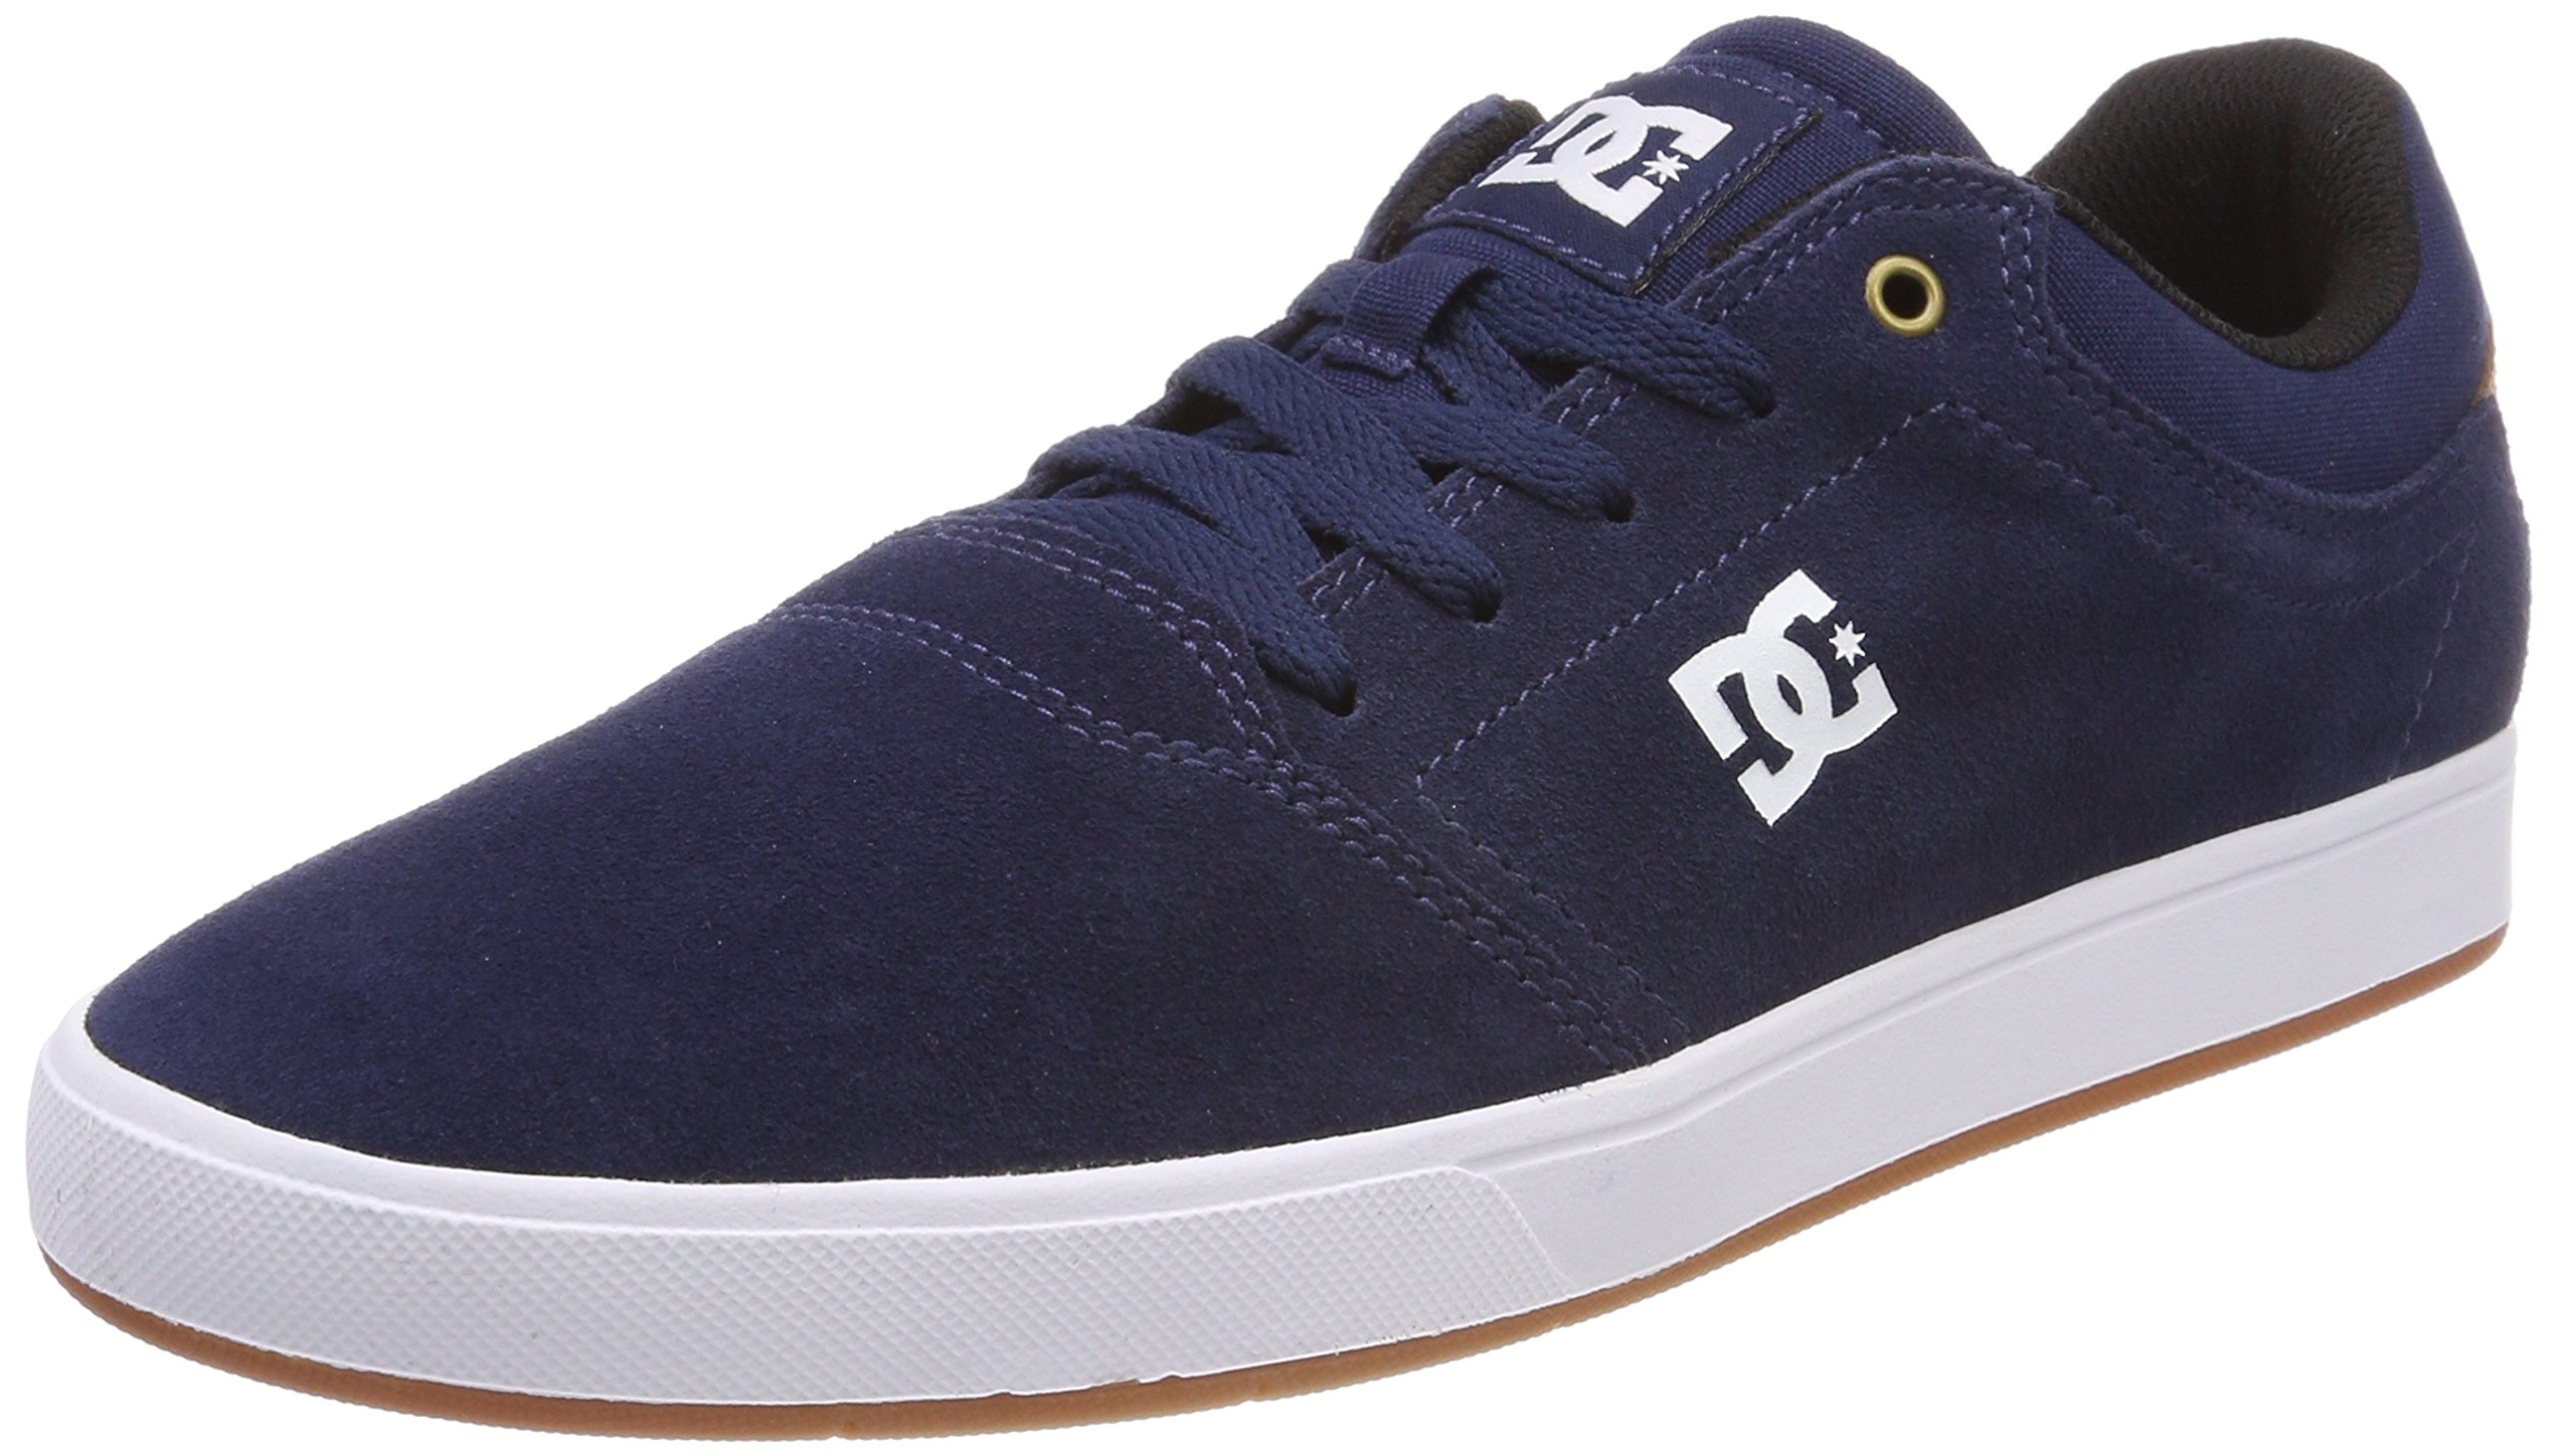 HommeBleunavy Eu Shoes white Nwh41 Dc CrisisBaskets XiOPkZuT